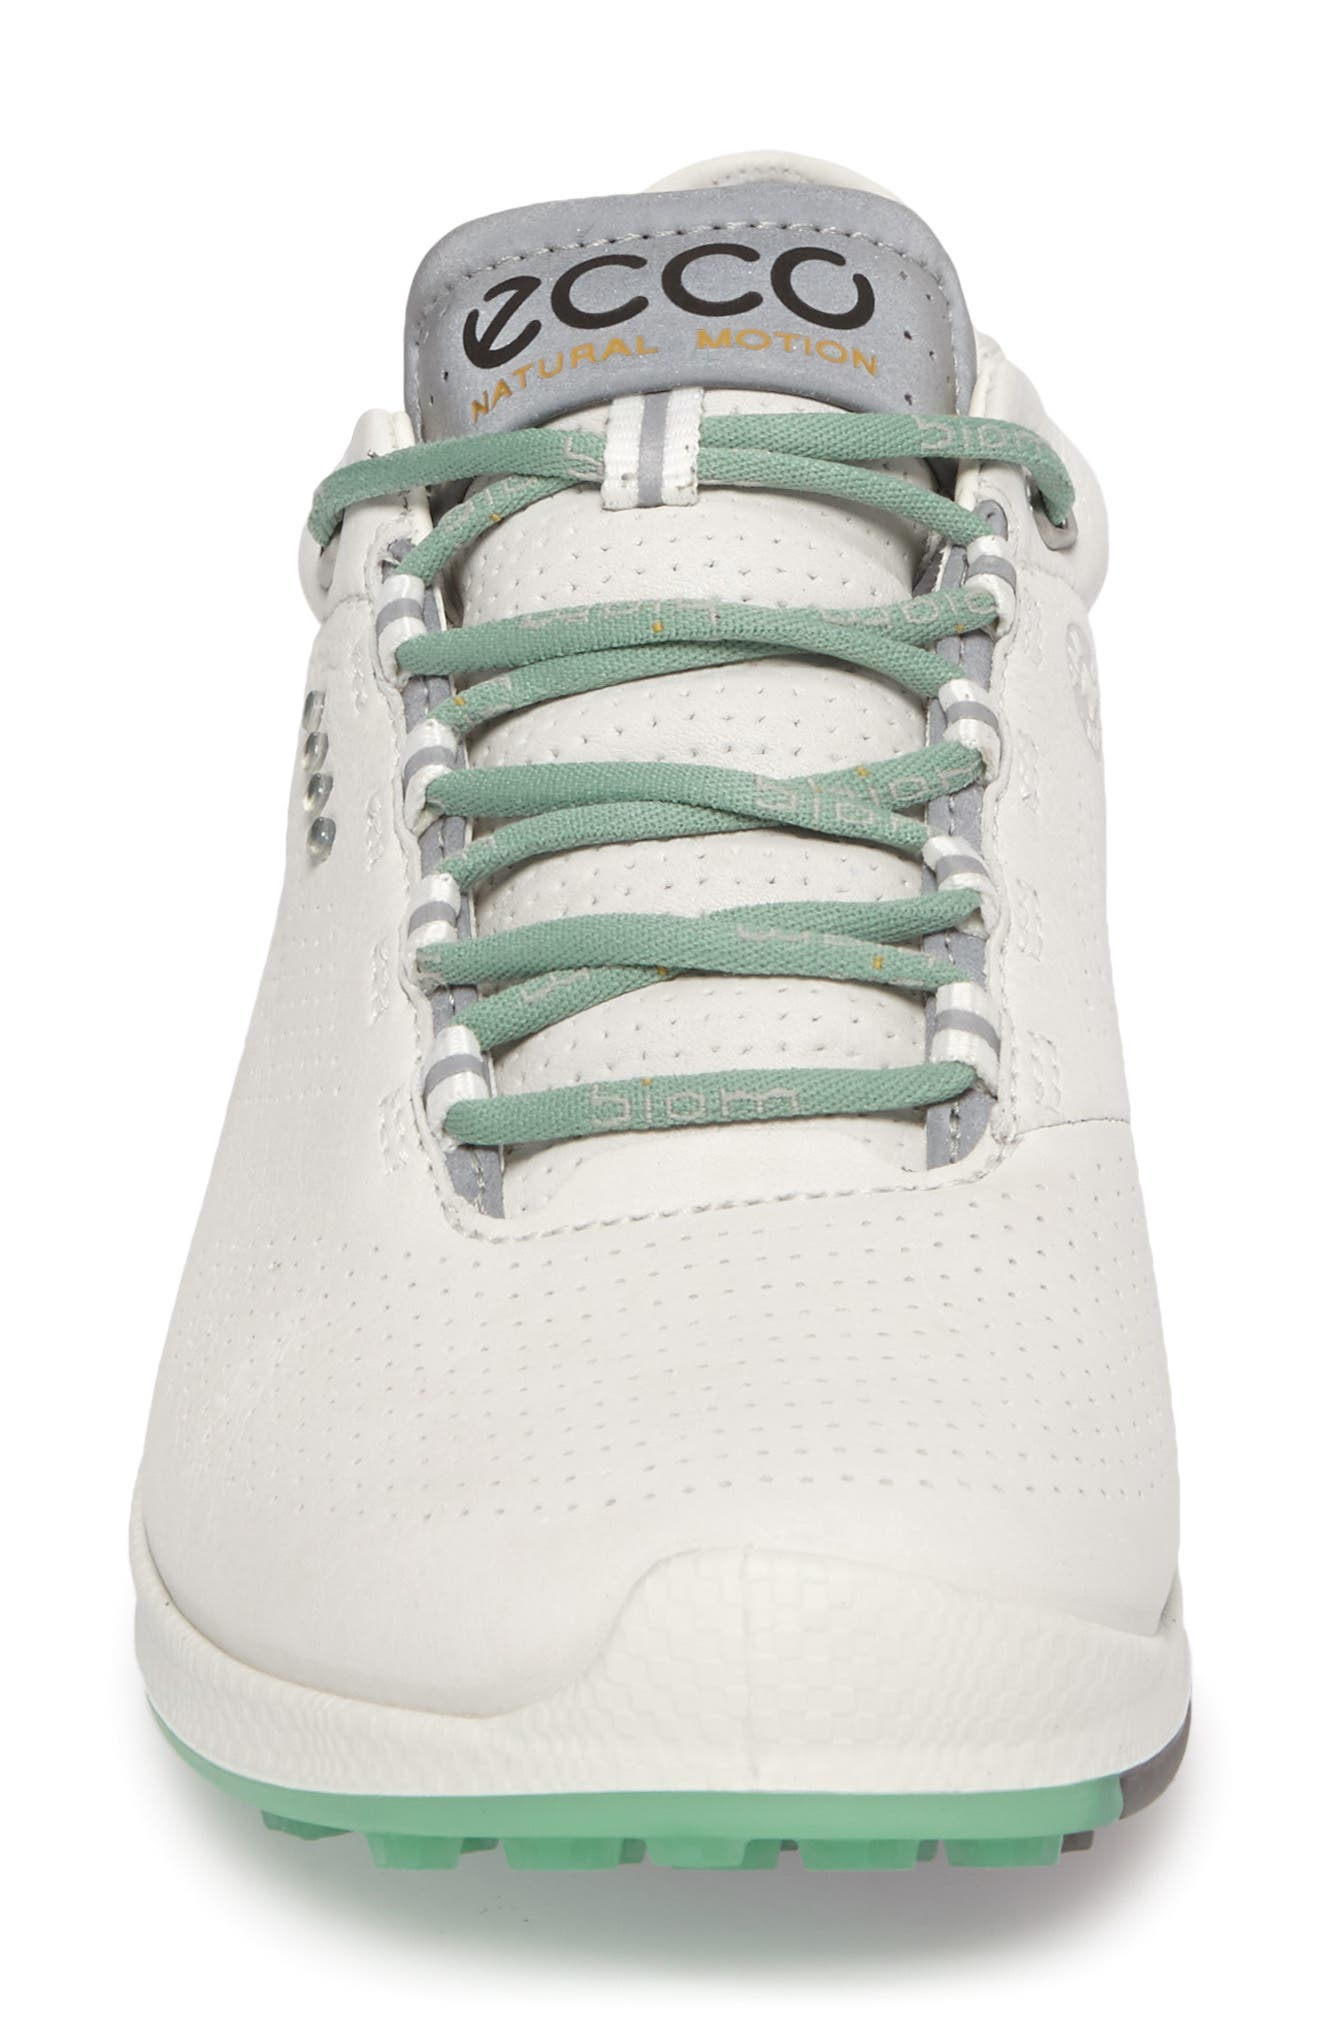 BIOM 2 Hybrid Water-Repellent Golf Shoe,                             Alternate thumbnail 4, color,                             WHITE/ GRANITE GREEN LEATHER